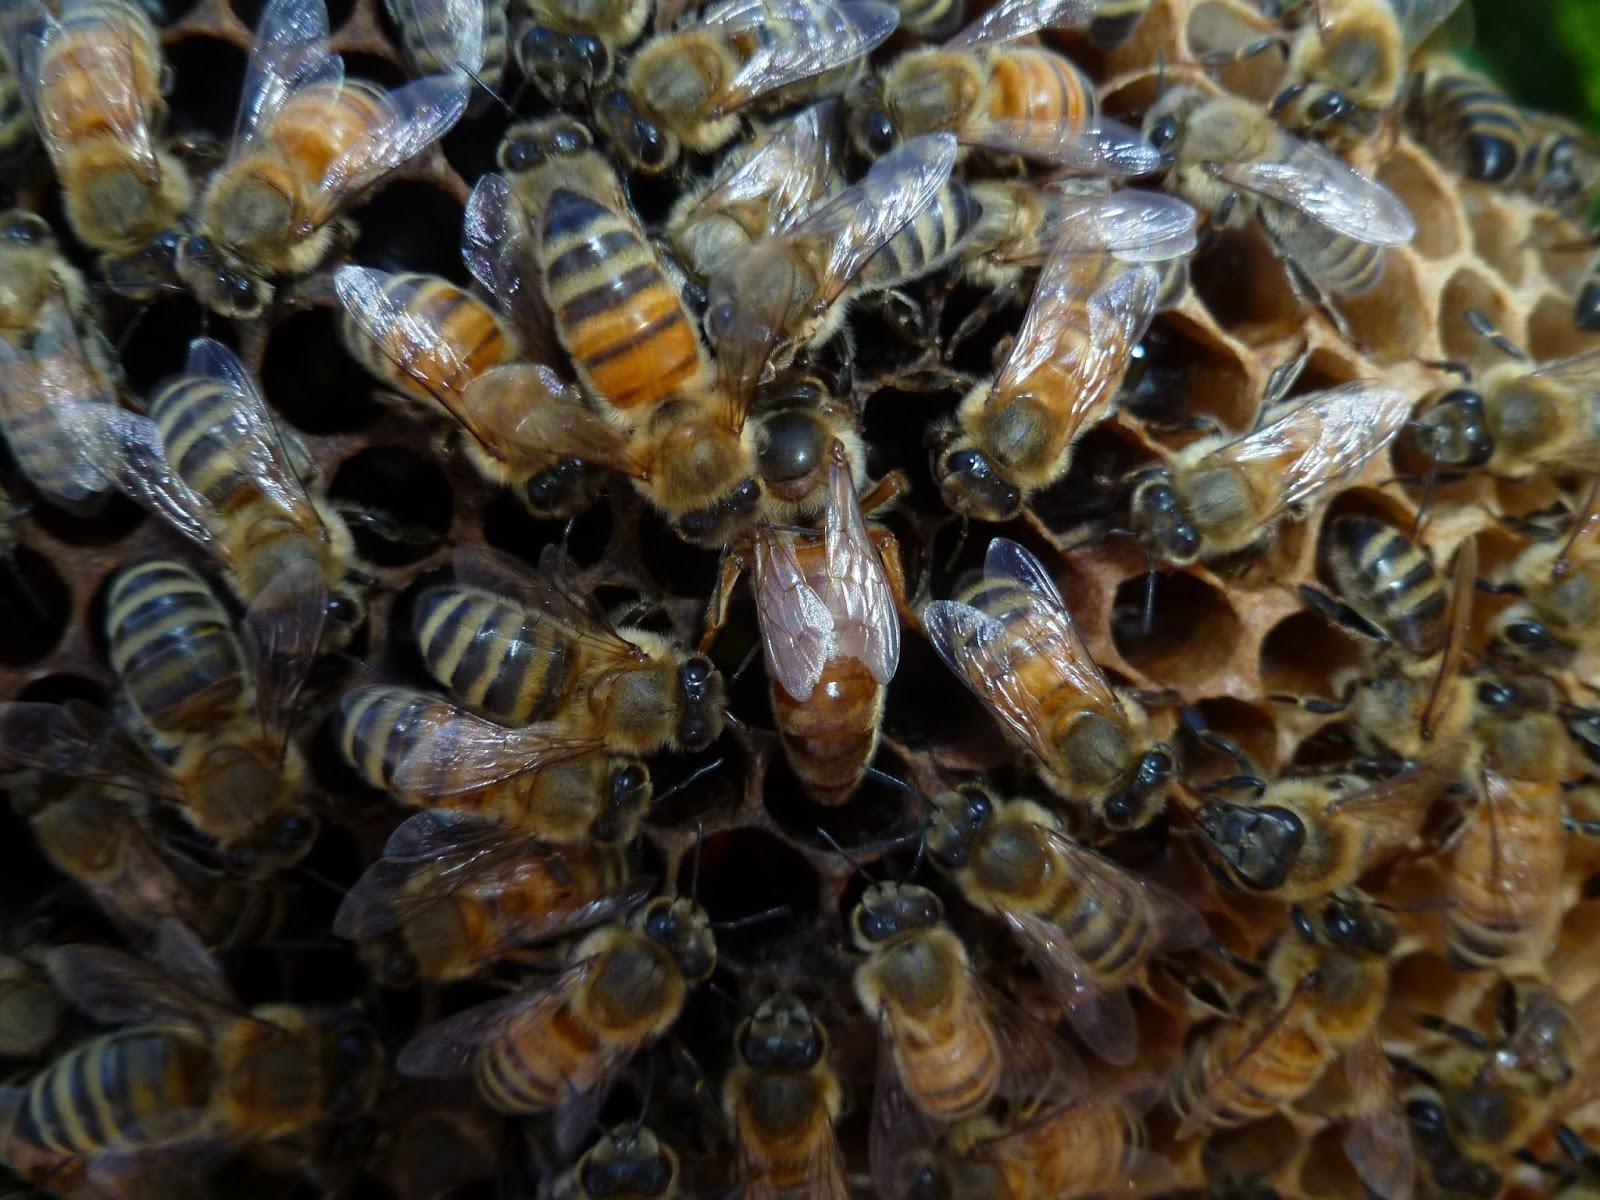 honey bee lavendar nectar wallpapers - Honey Bee Lavender Nectar Ewallpapers Hub